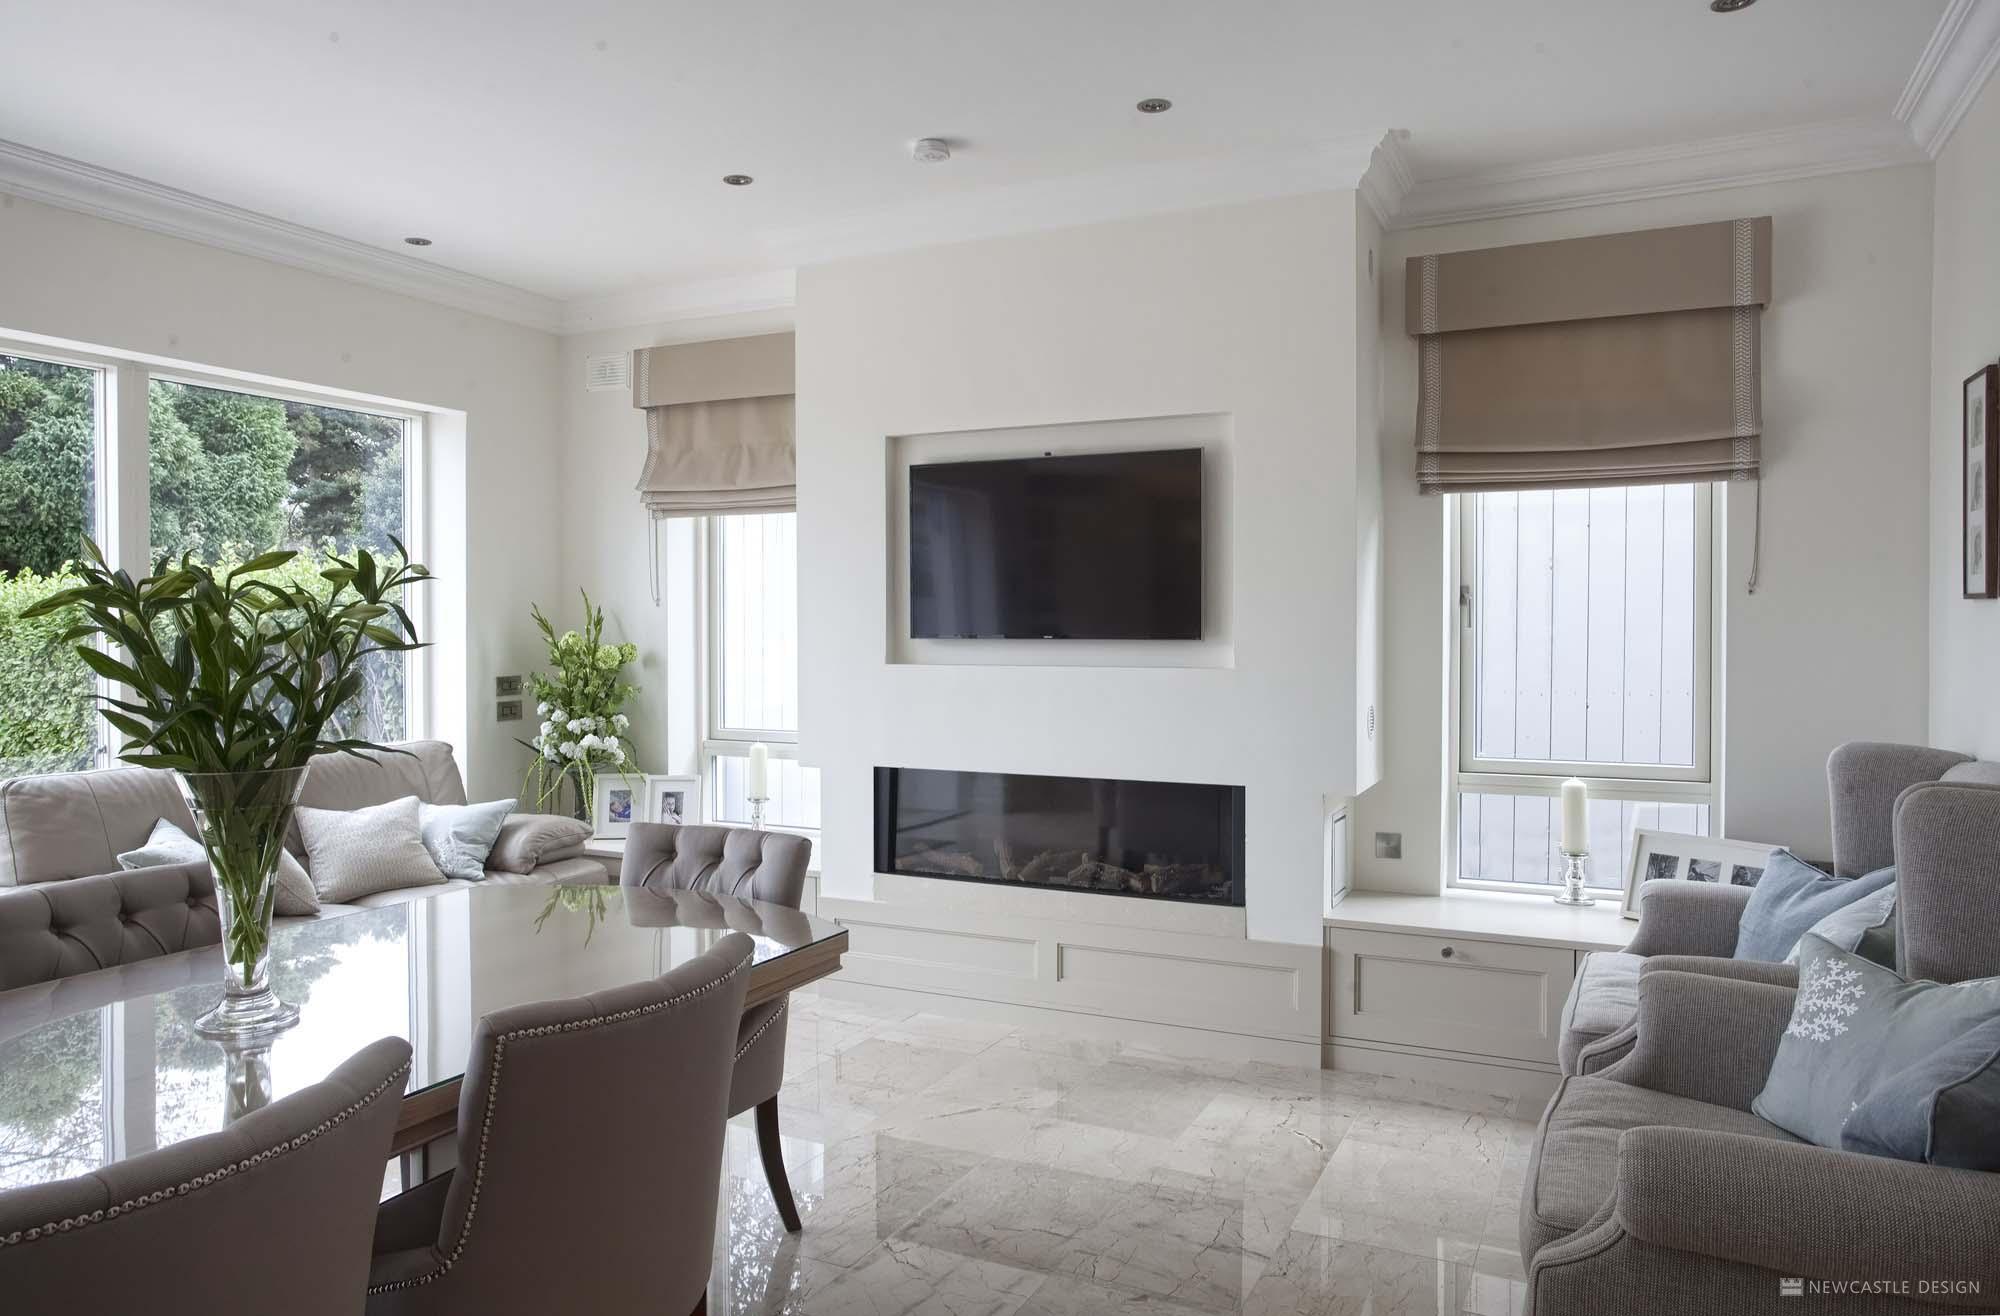 Kitchen design galway classical interiors ireland for Kitchen design galway